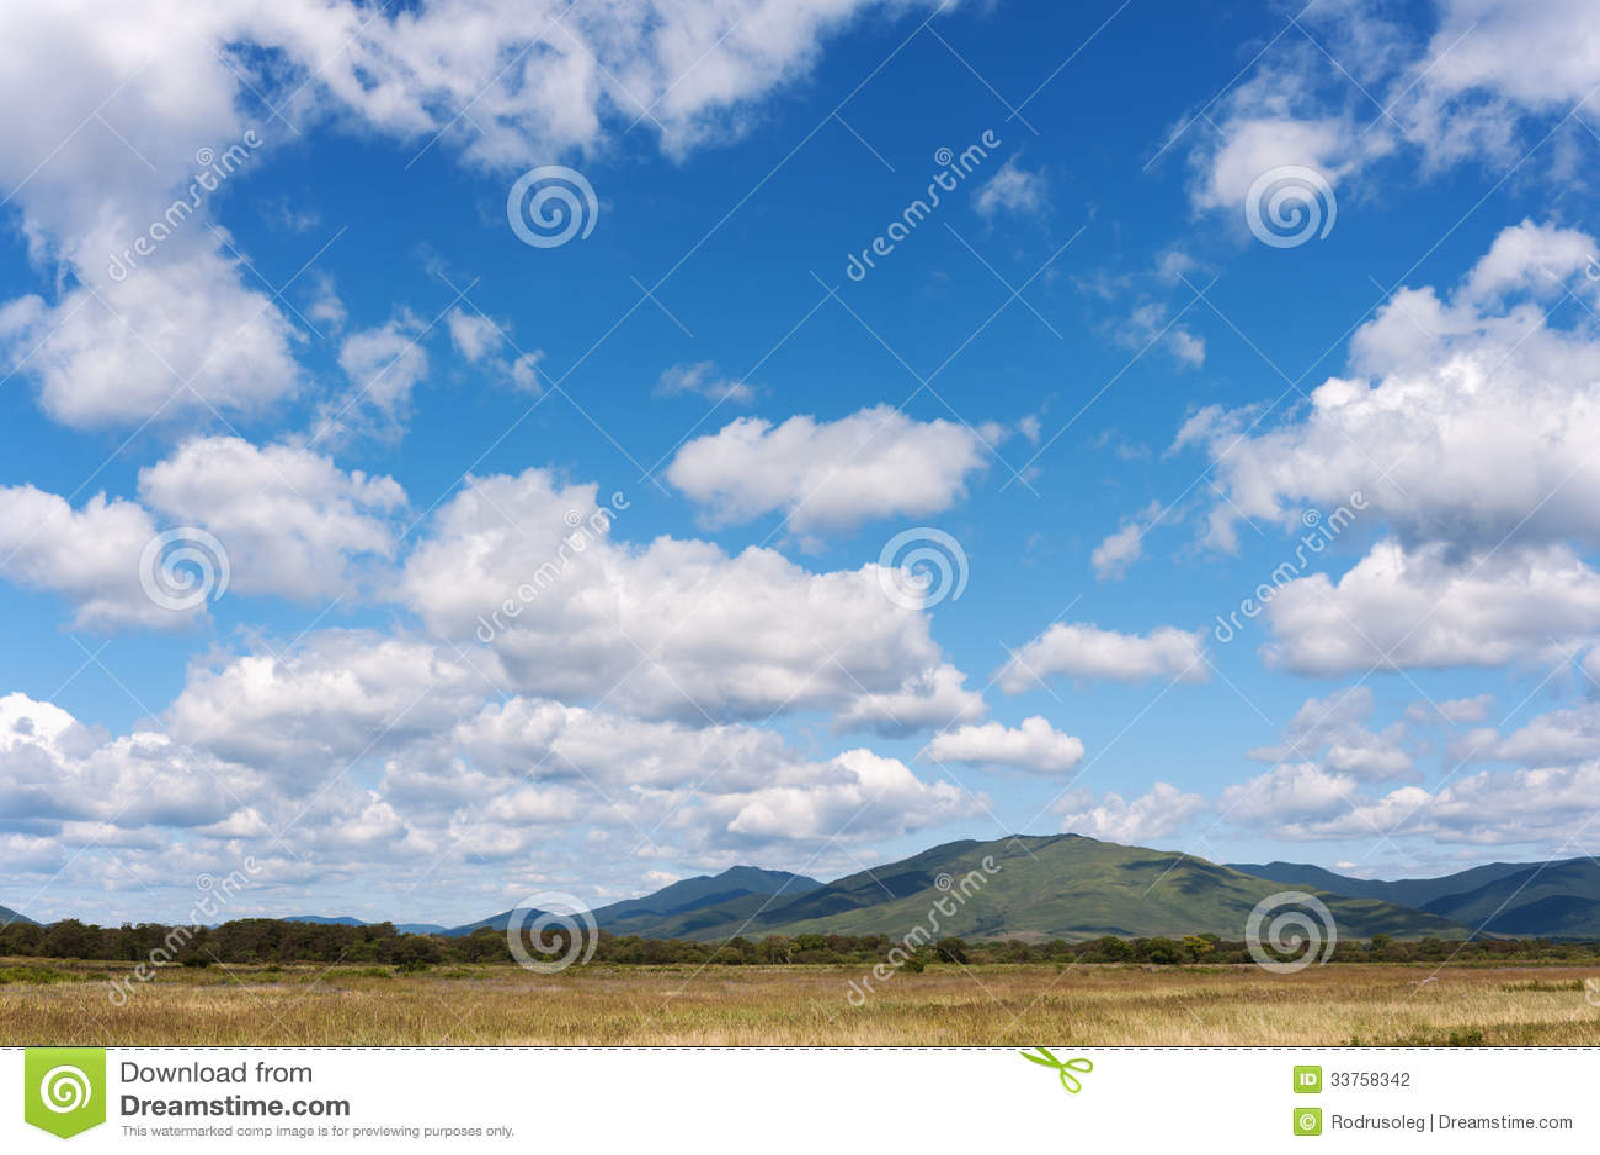 mountains sky light clouds - photo #40